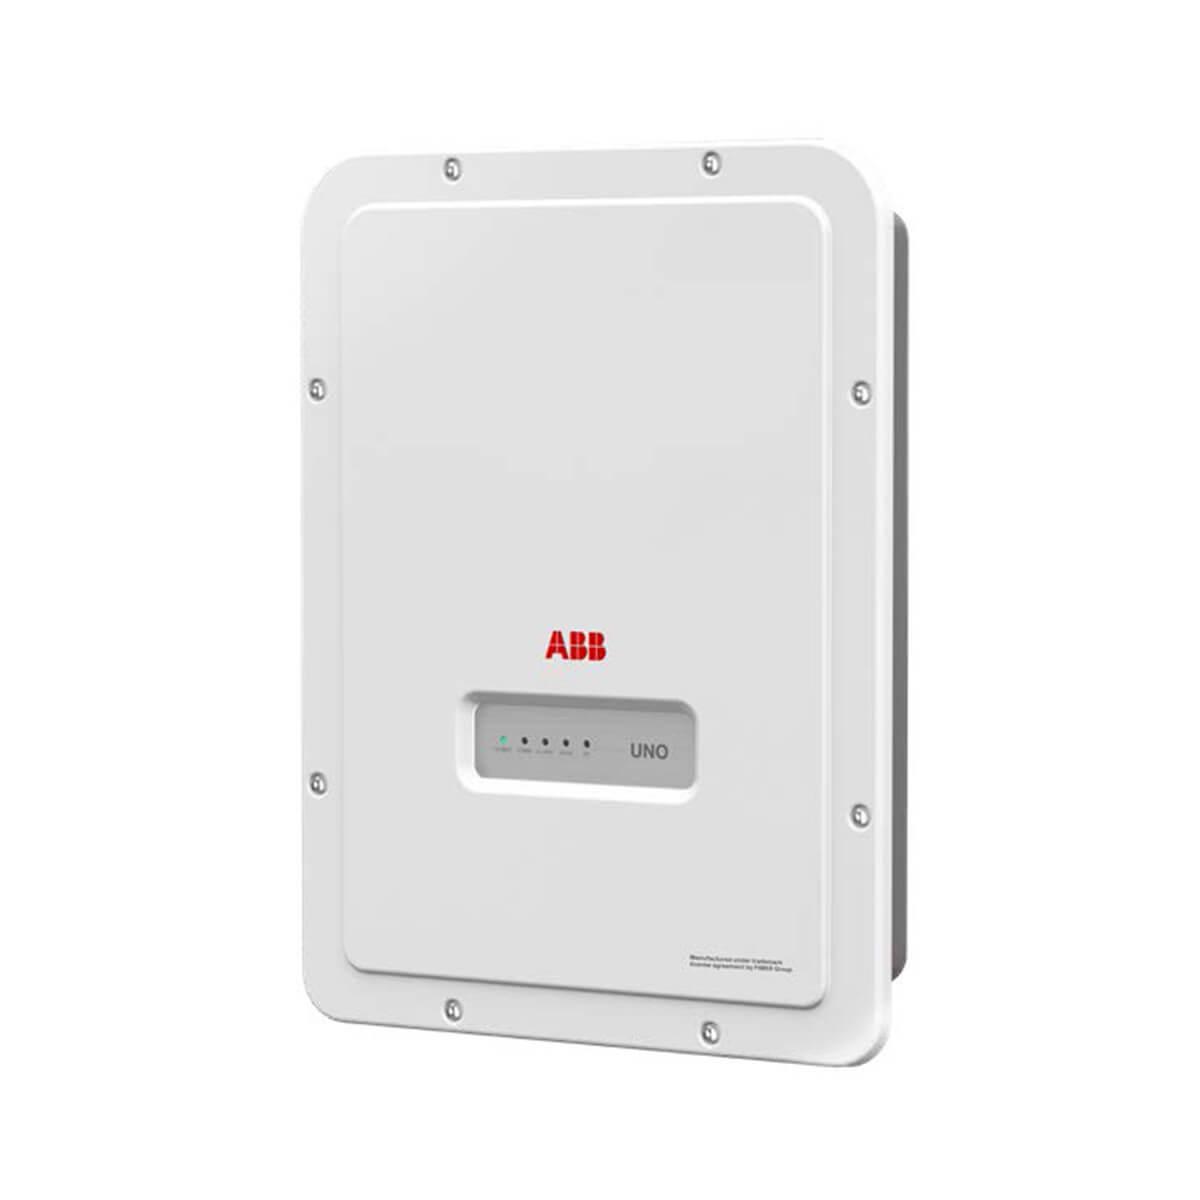 abb fimer 3.3kW inverter, abb fimer uno-dm 3.3kW inverter, abb fimer uno-dm-3.3-tl-plus-q inverter, abb fimer uno-dm-3.3-tl-plus-q, abb fimer uno-dm 3.3 kW, ABB FIMER 3.3 KW